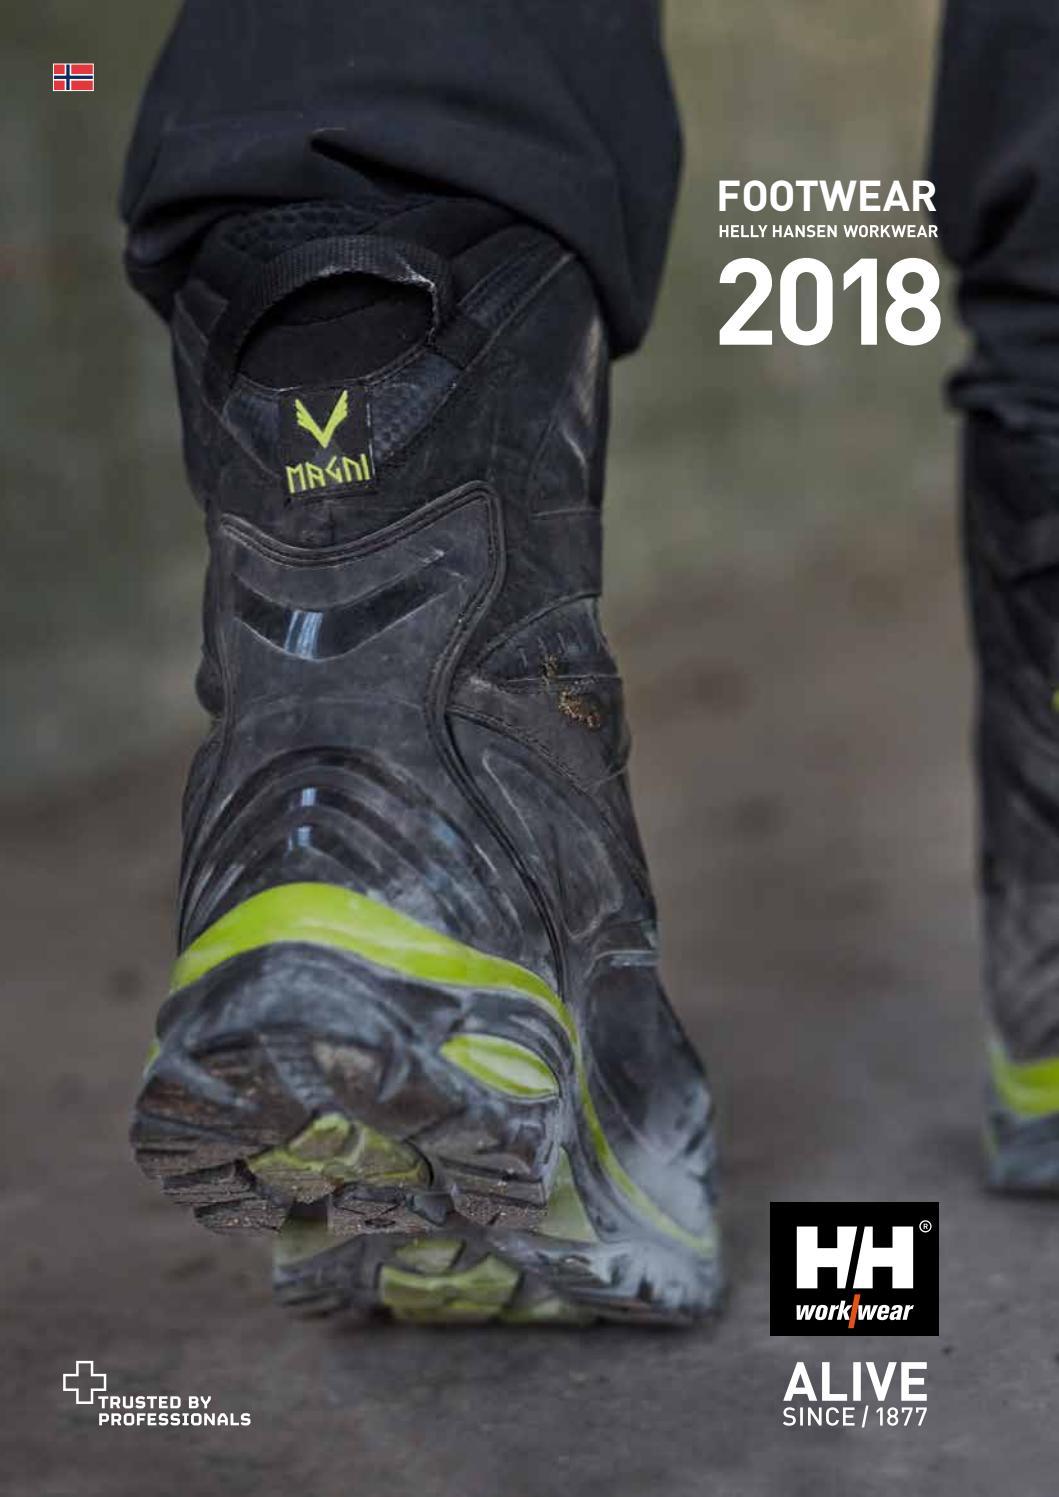 3108ffe9 Helly Hansen Workwear Footwear 2018 – Norwegian by HH Workwear - issuu